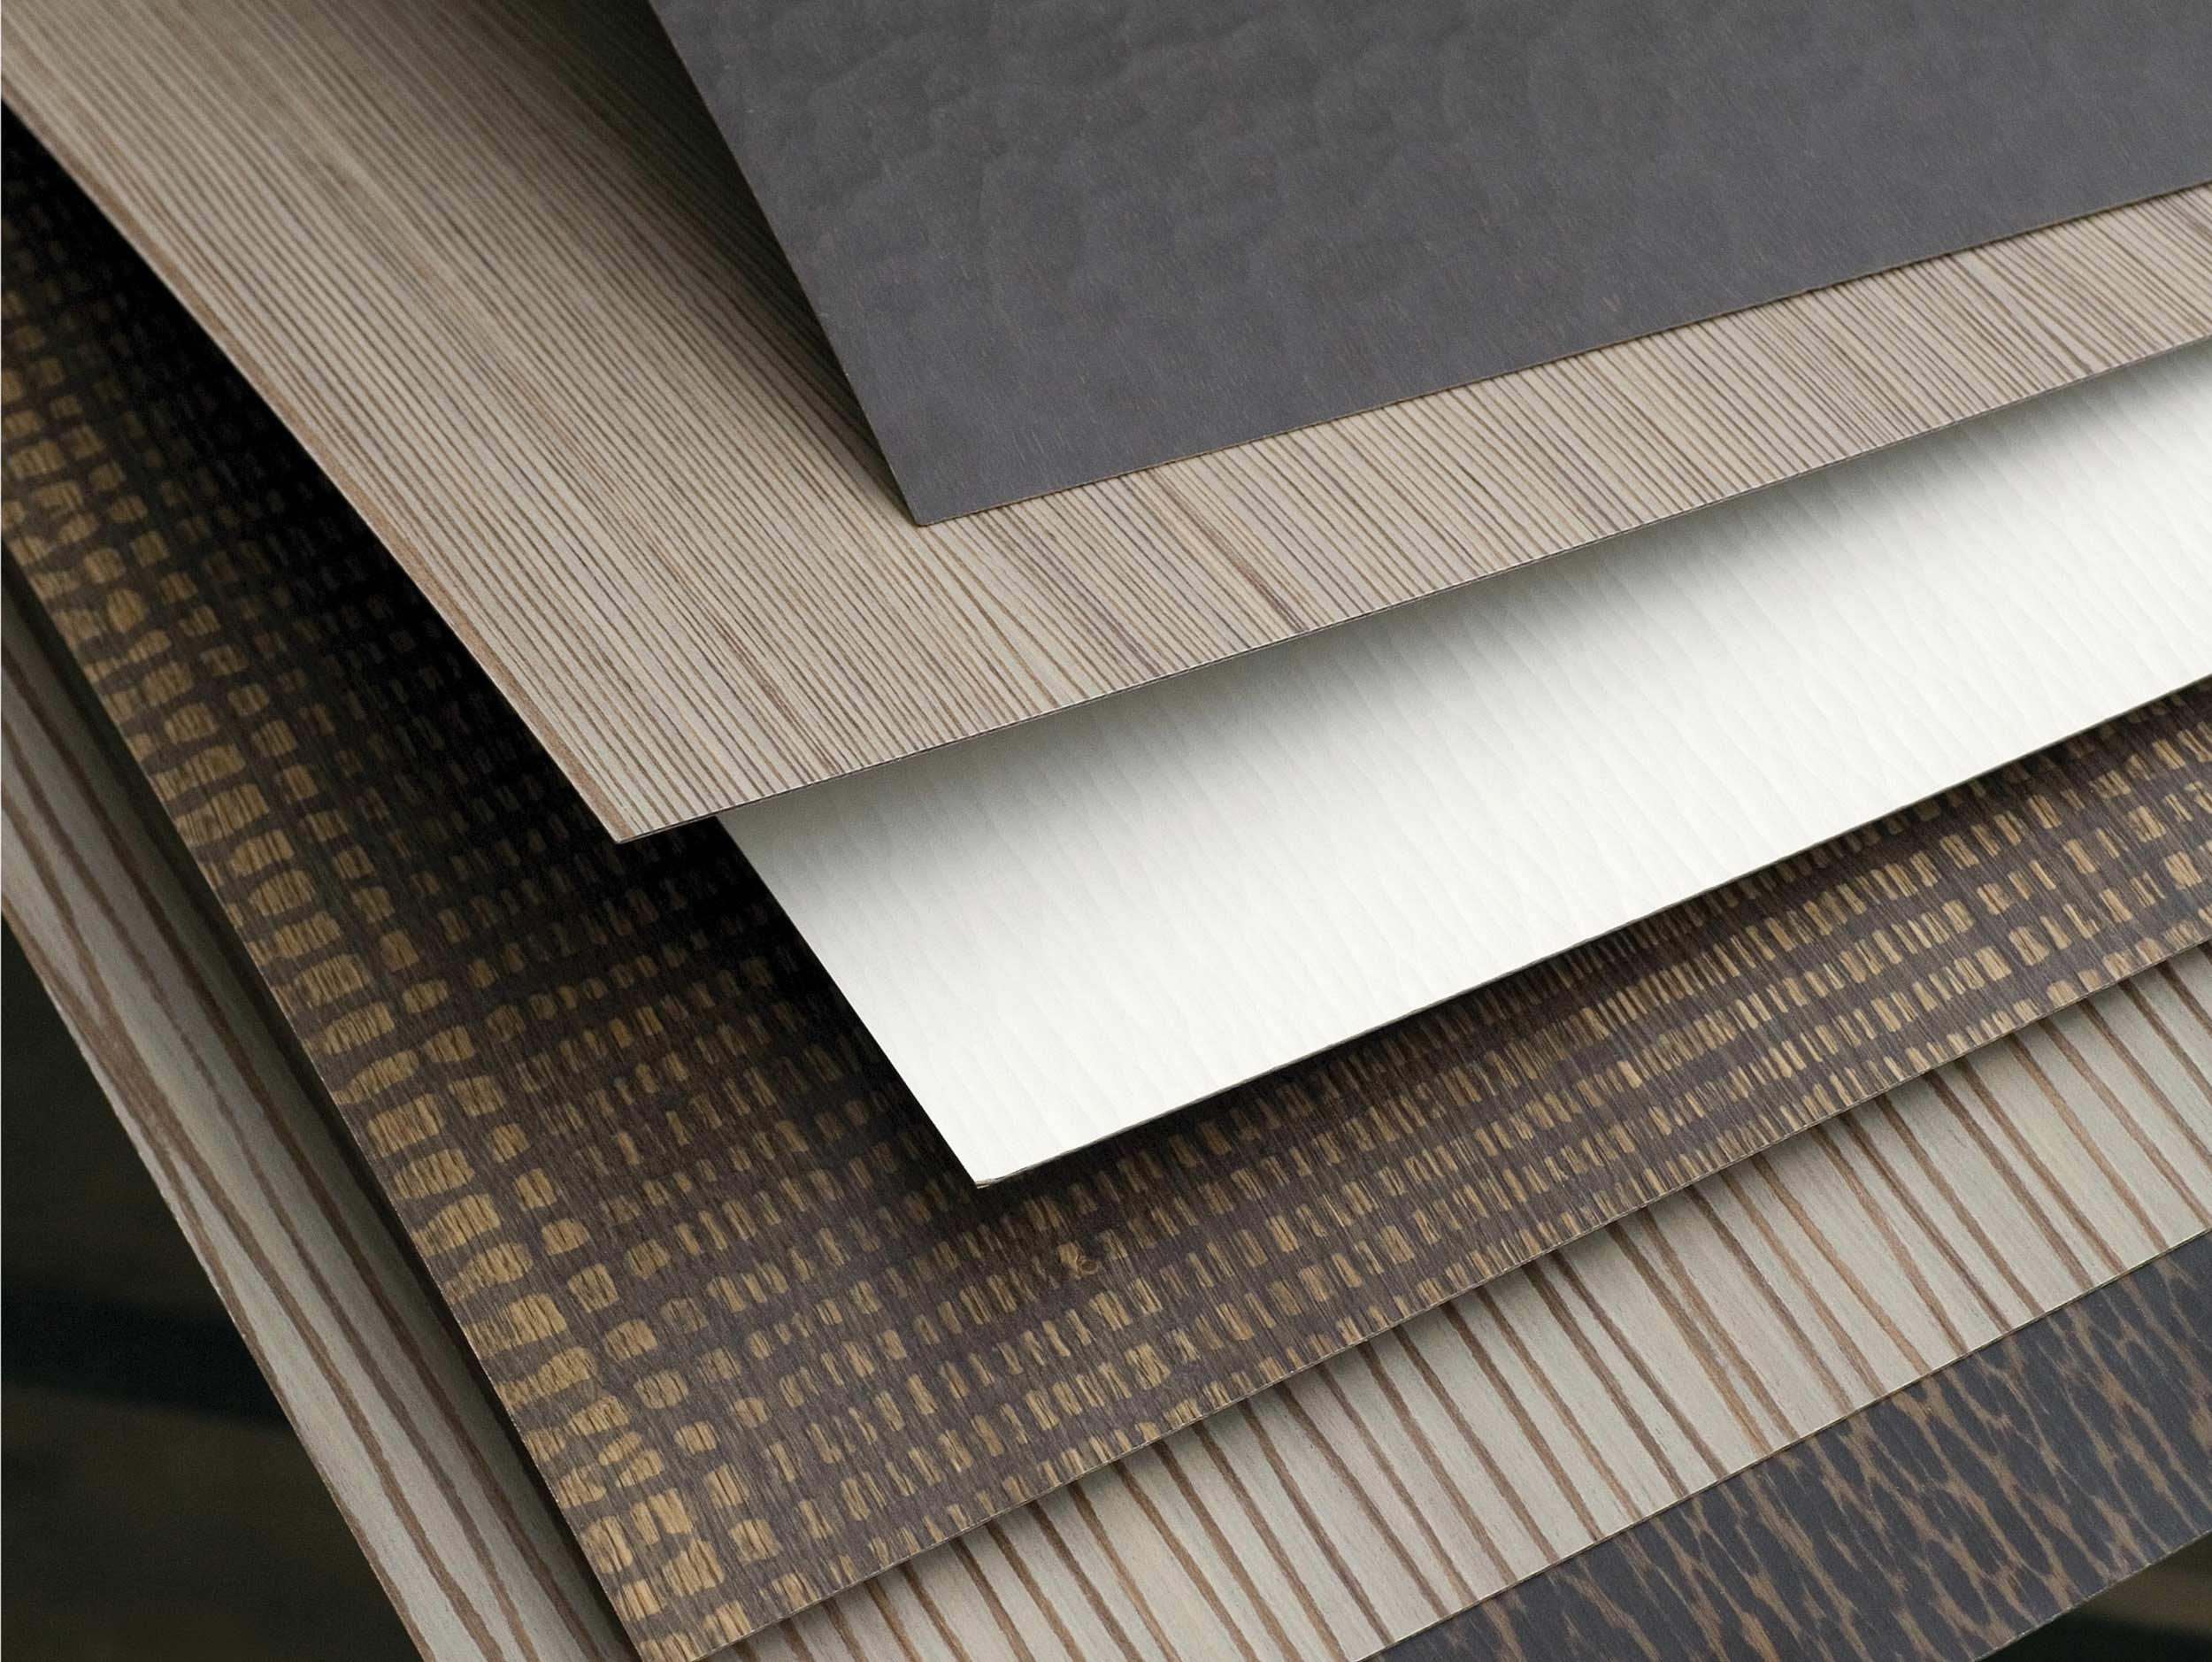 Teksturer og ulike overflatebehandlinger er Obers spesialitet.